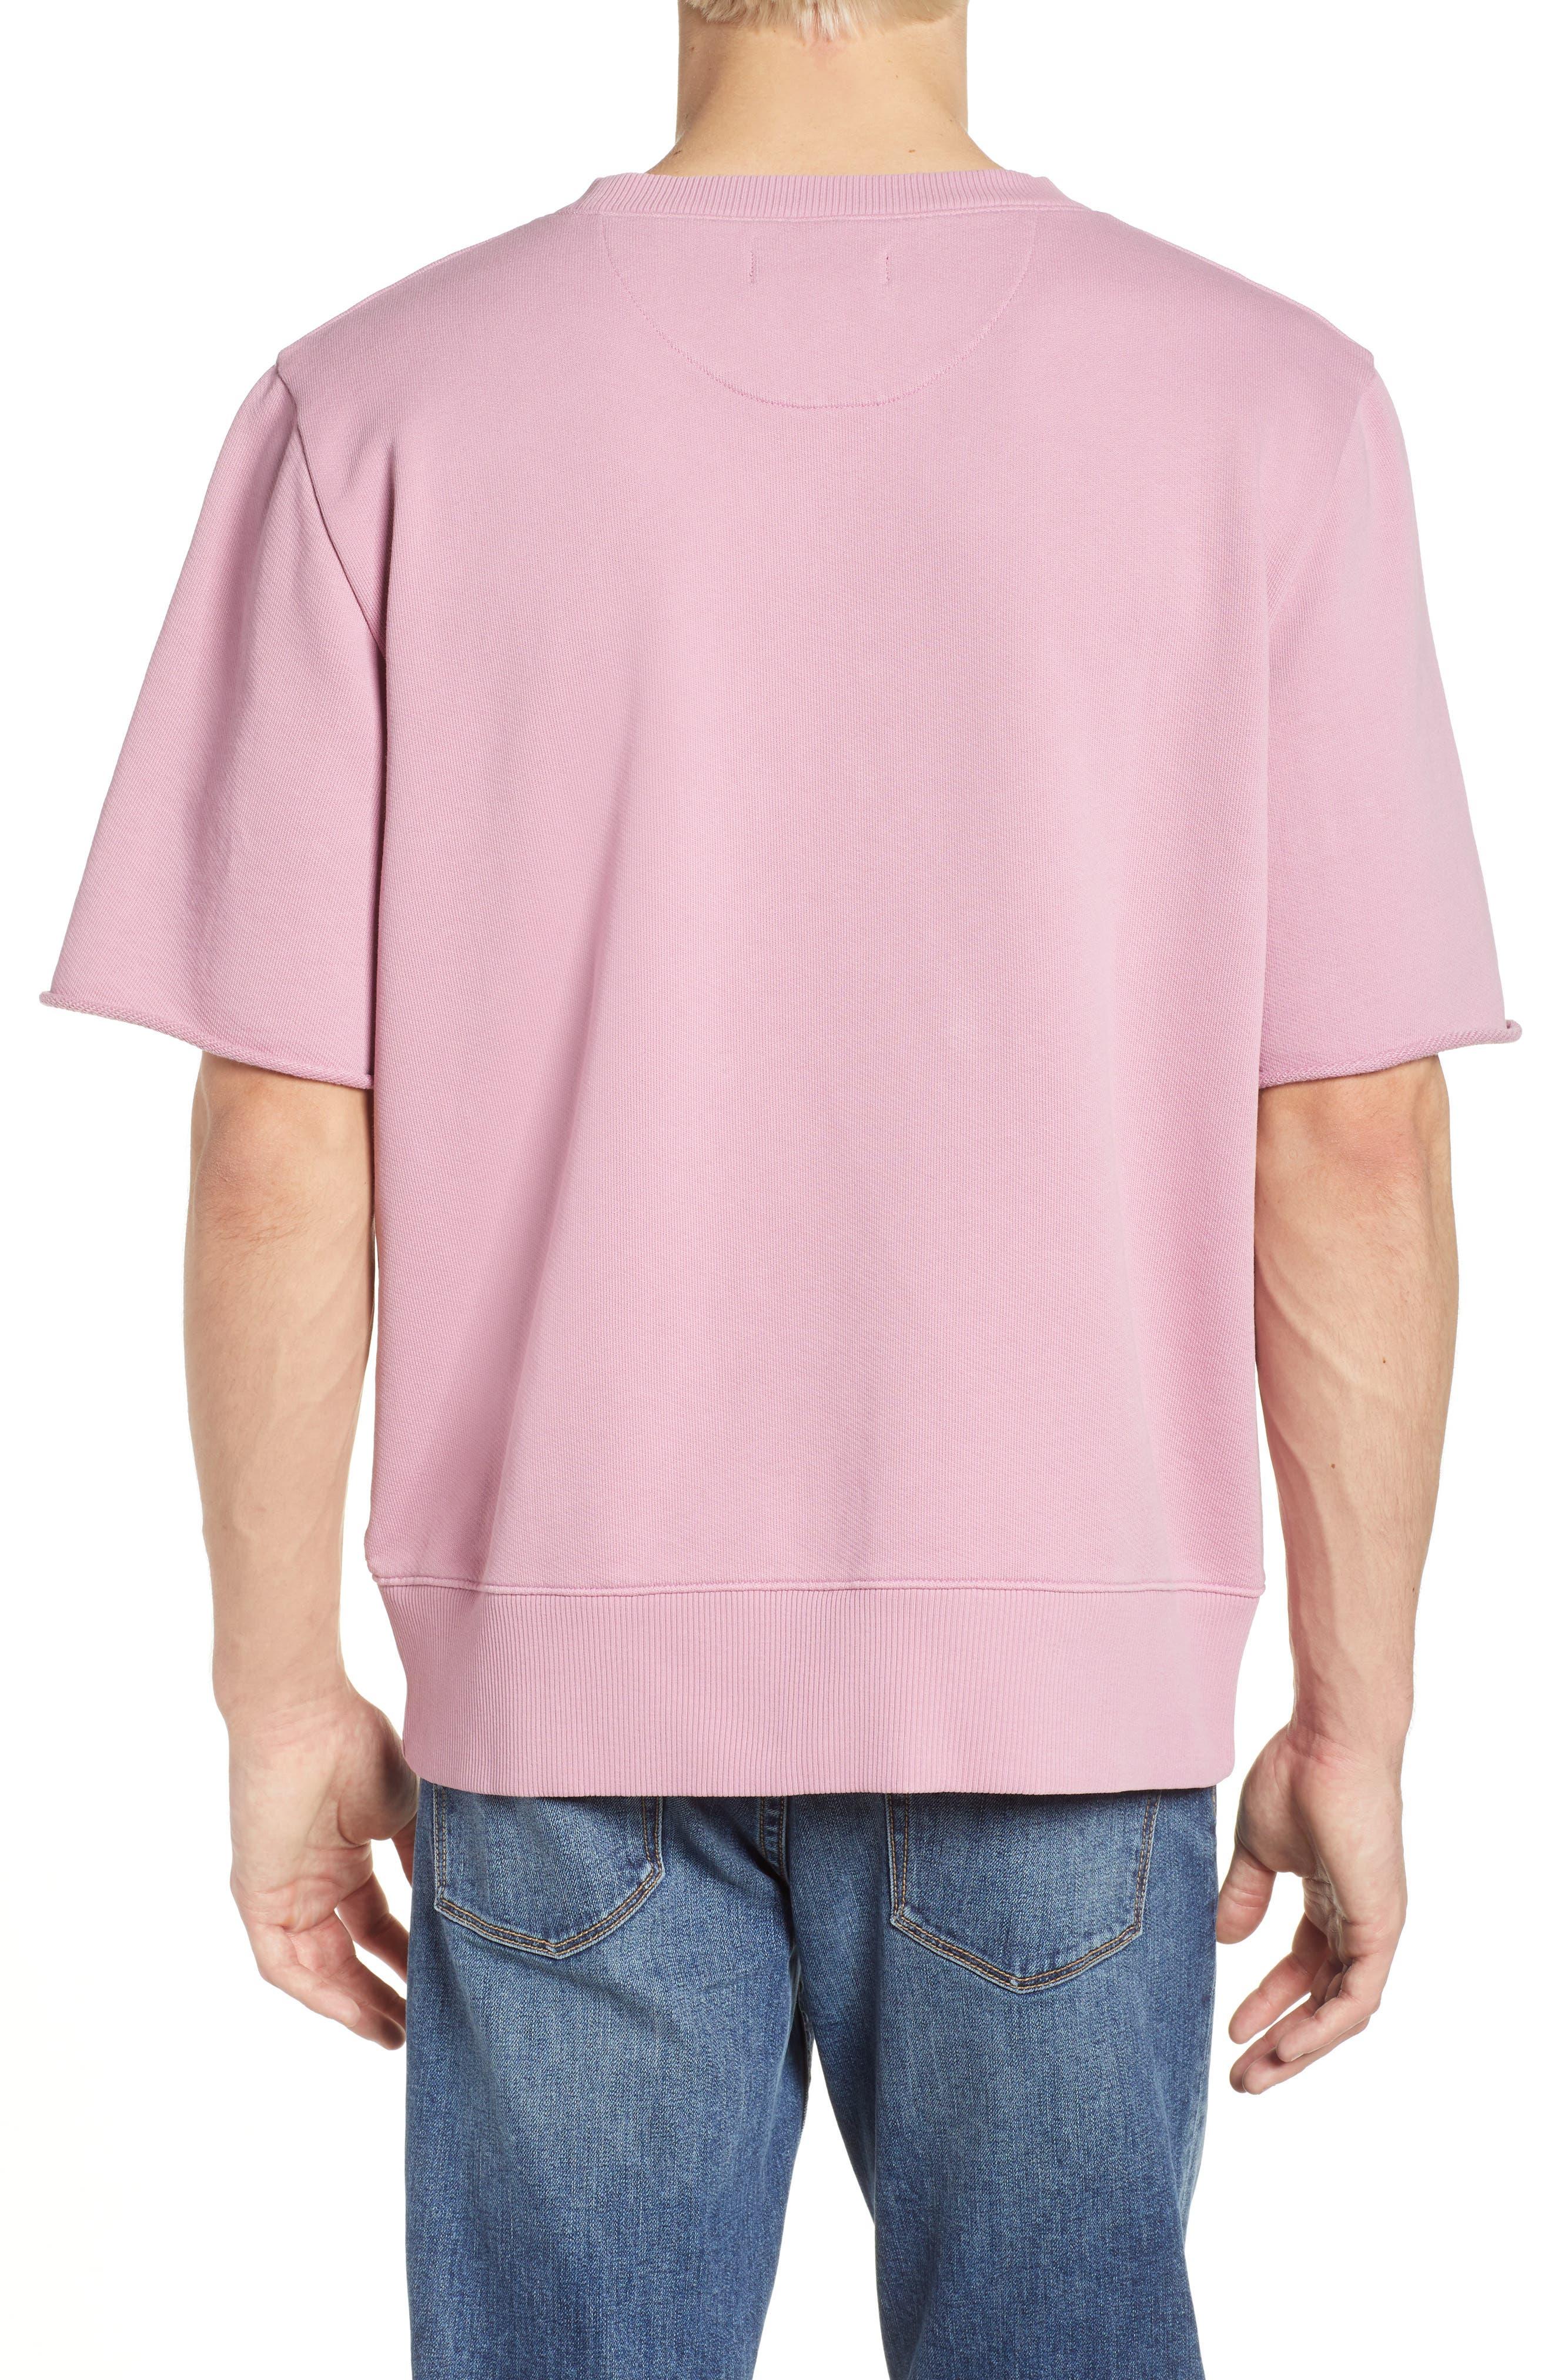 Cotton Terry Sweatshirt,                             Alternate thumbnail 4, color,